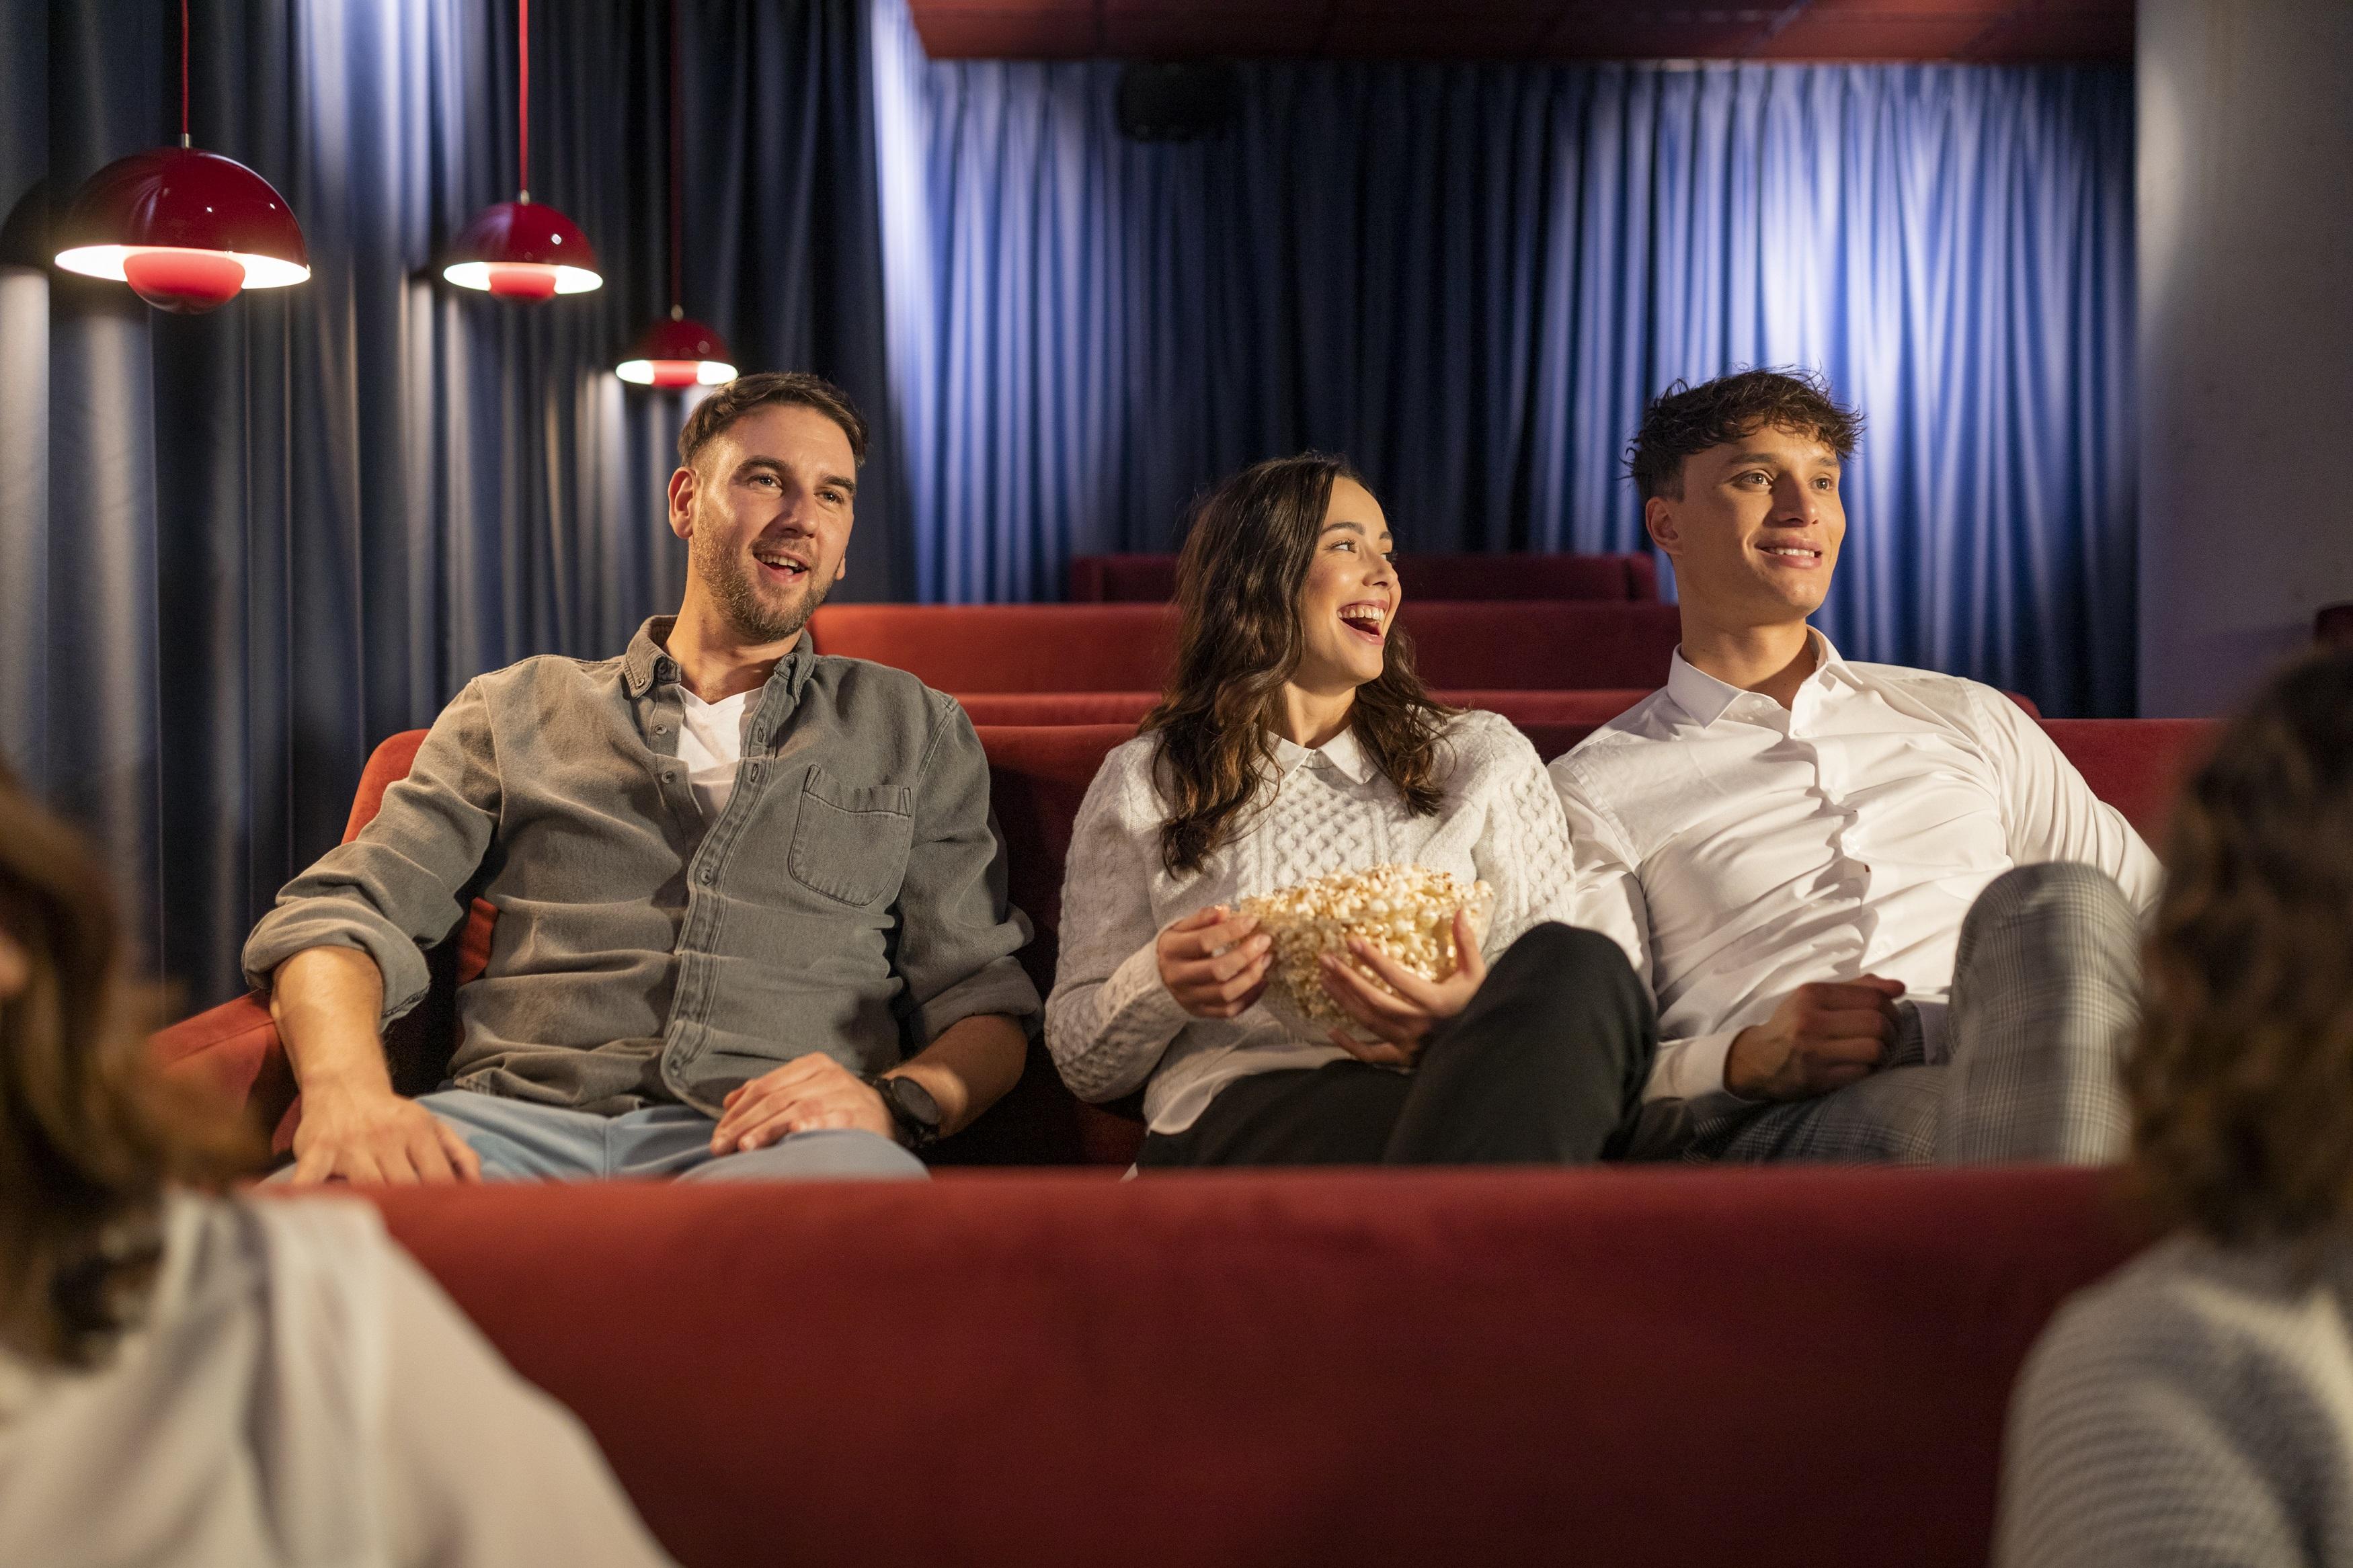 friends sitting in the cinema at OurDomain Amsterdam Diemen